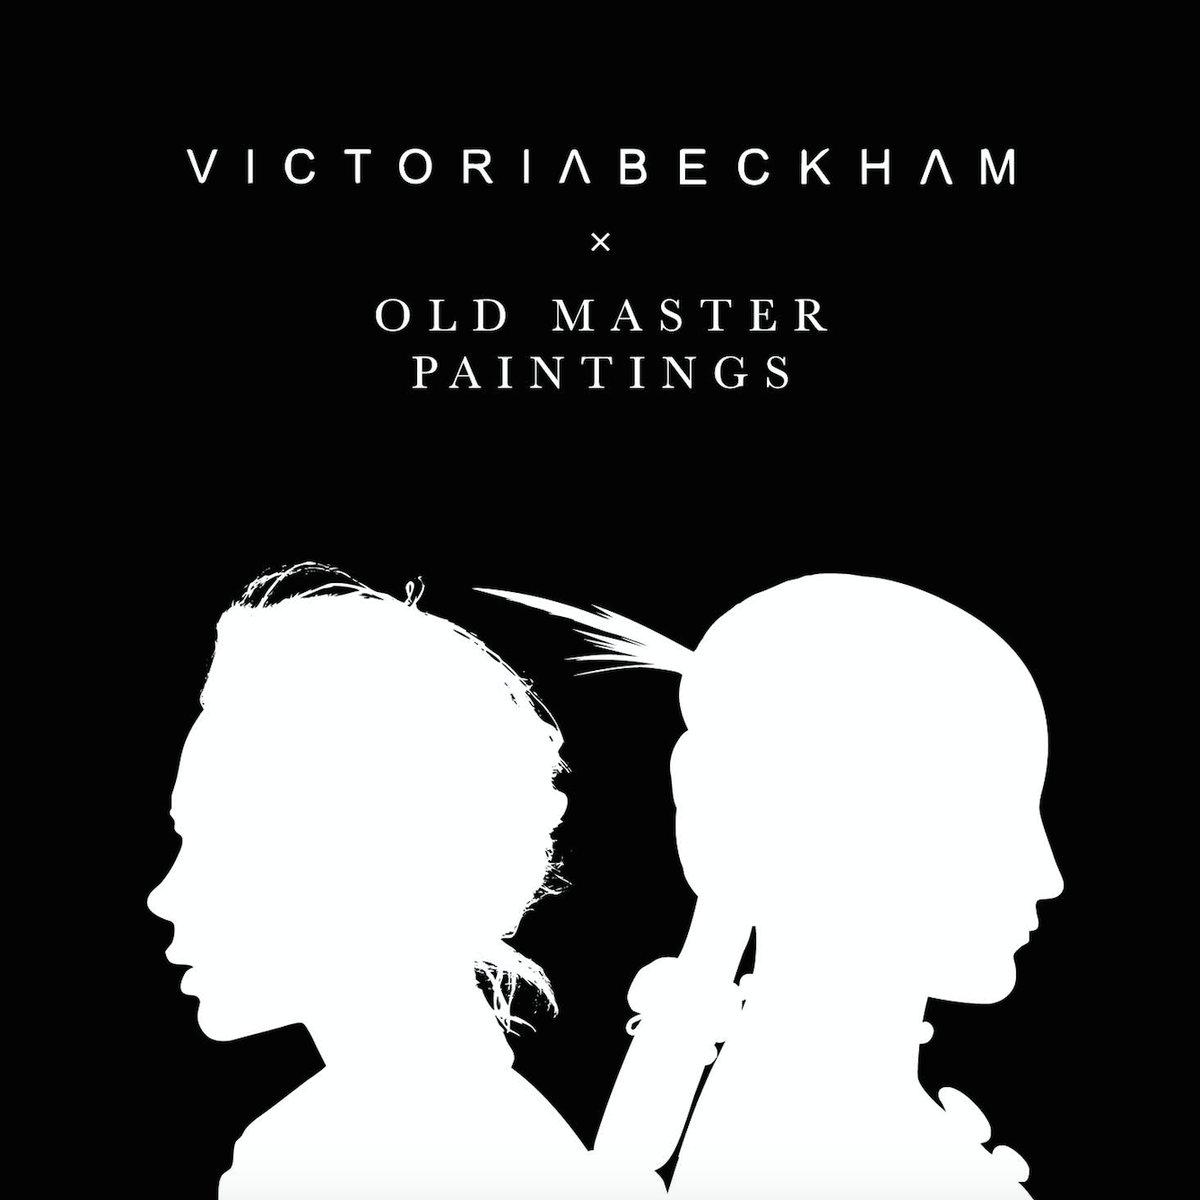 Victoria Beckham x Sothebys